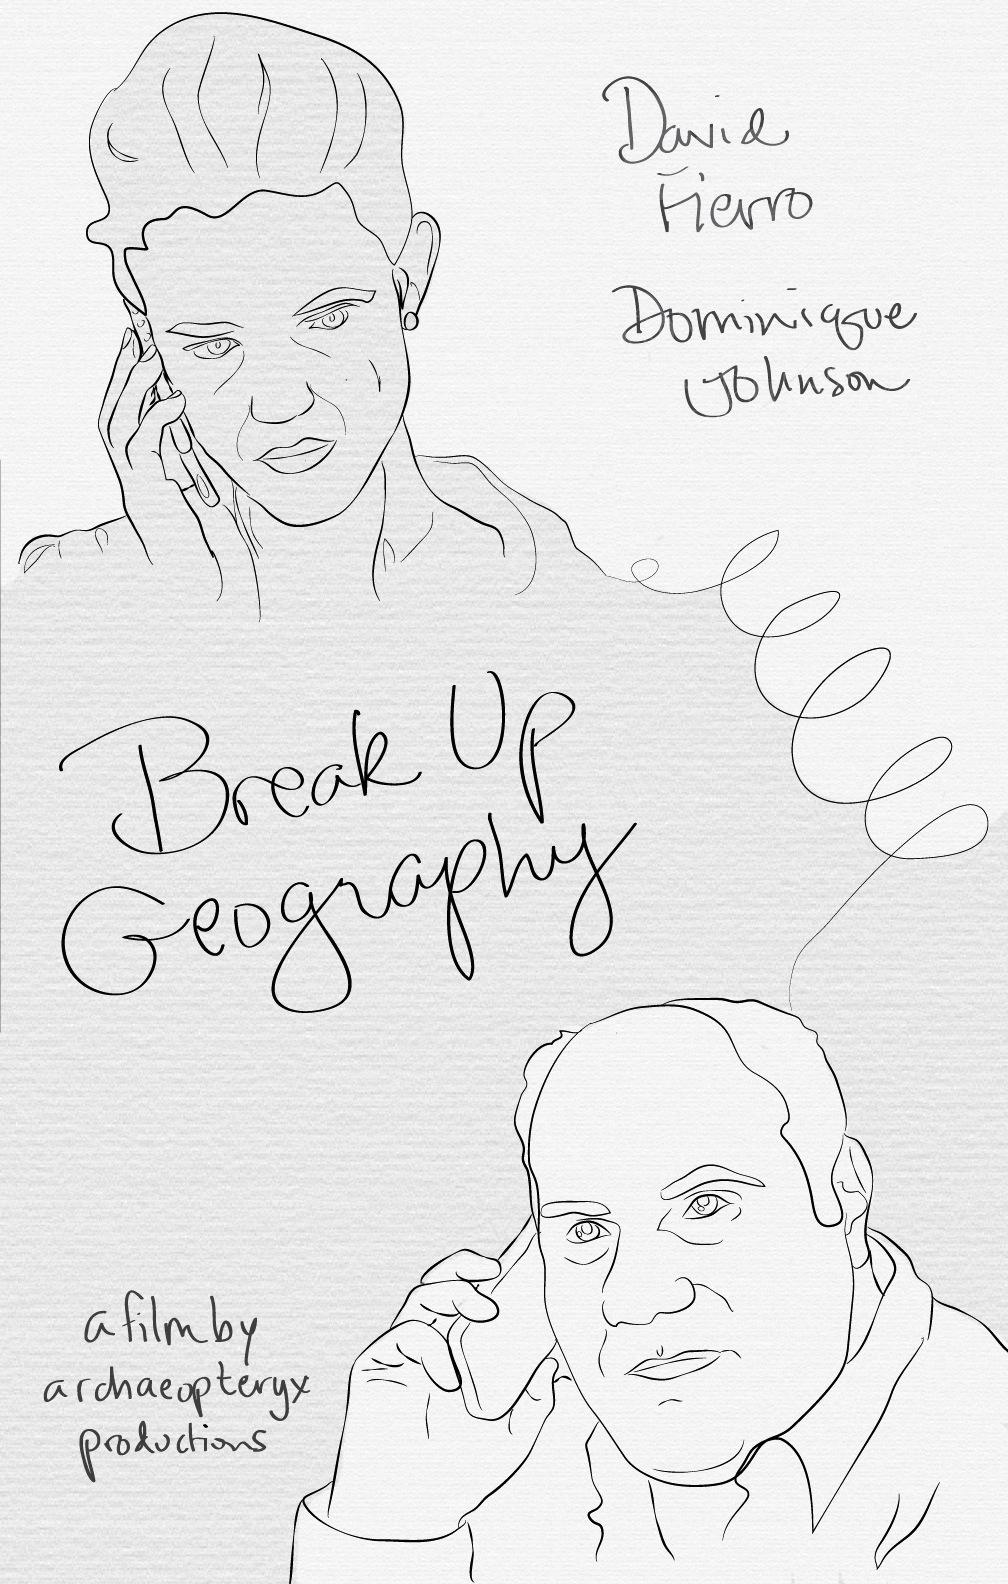 Break Up Geography